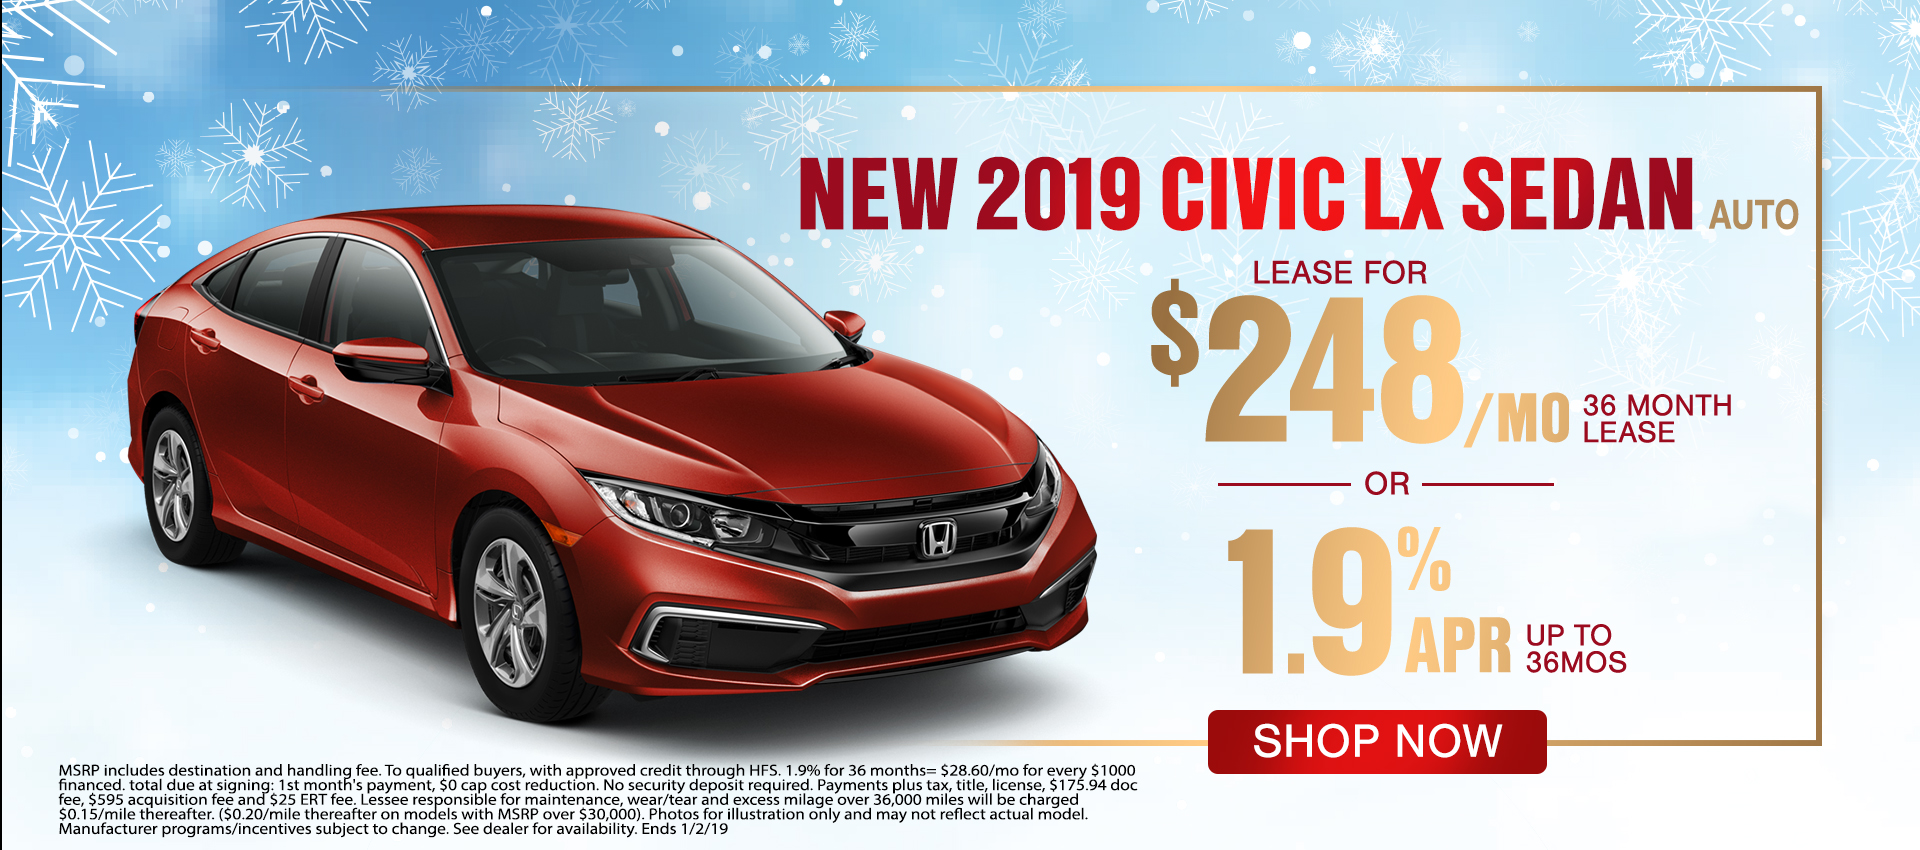 Civic Sedan - Lease for $248